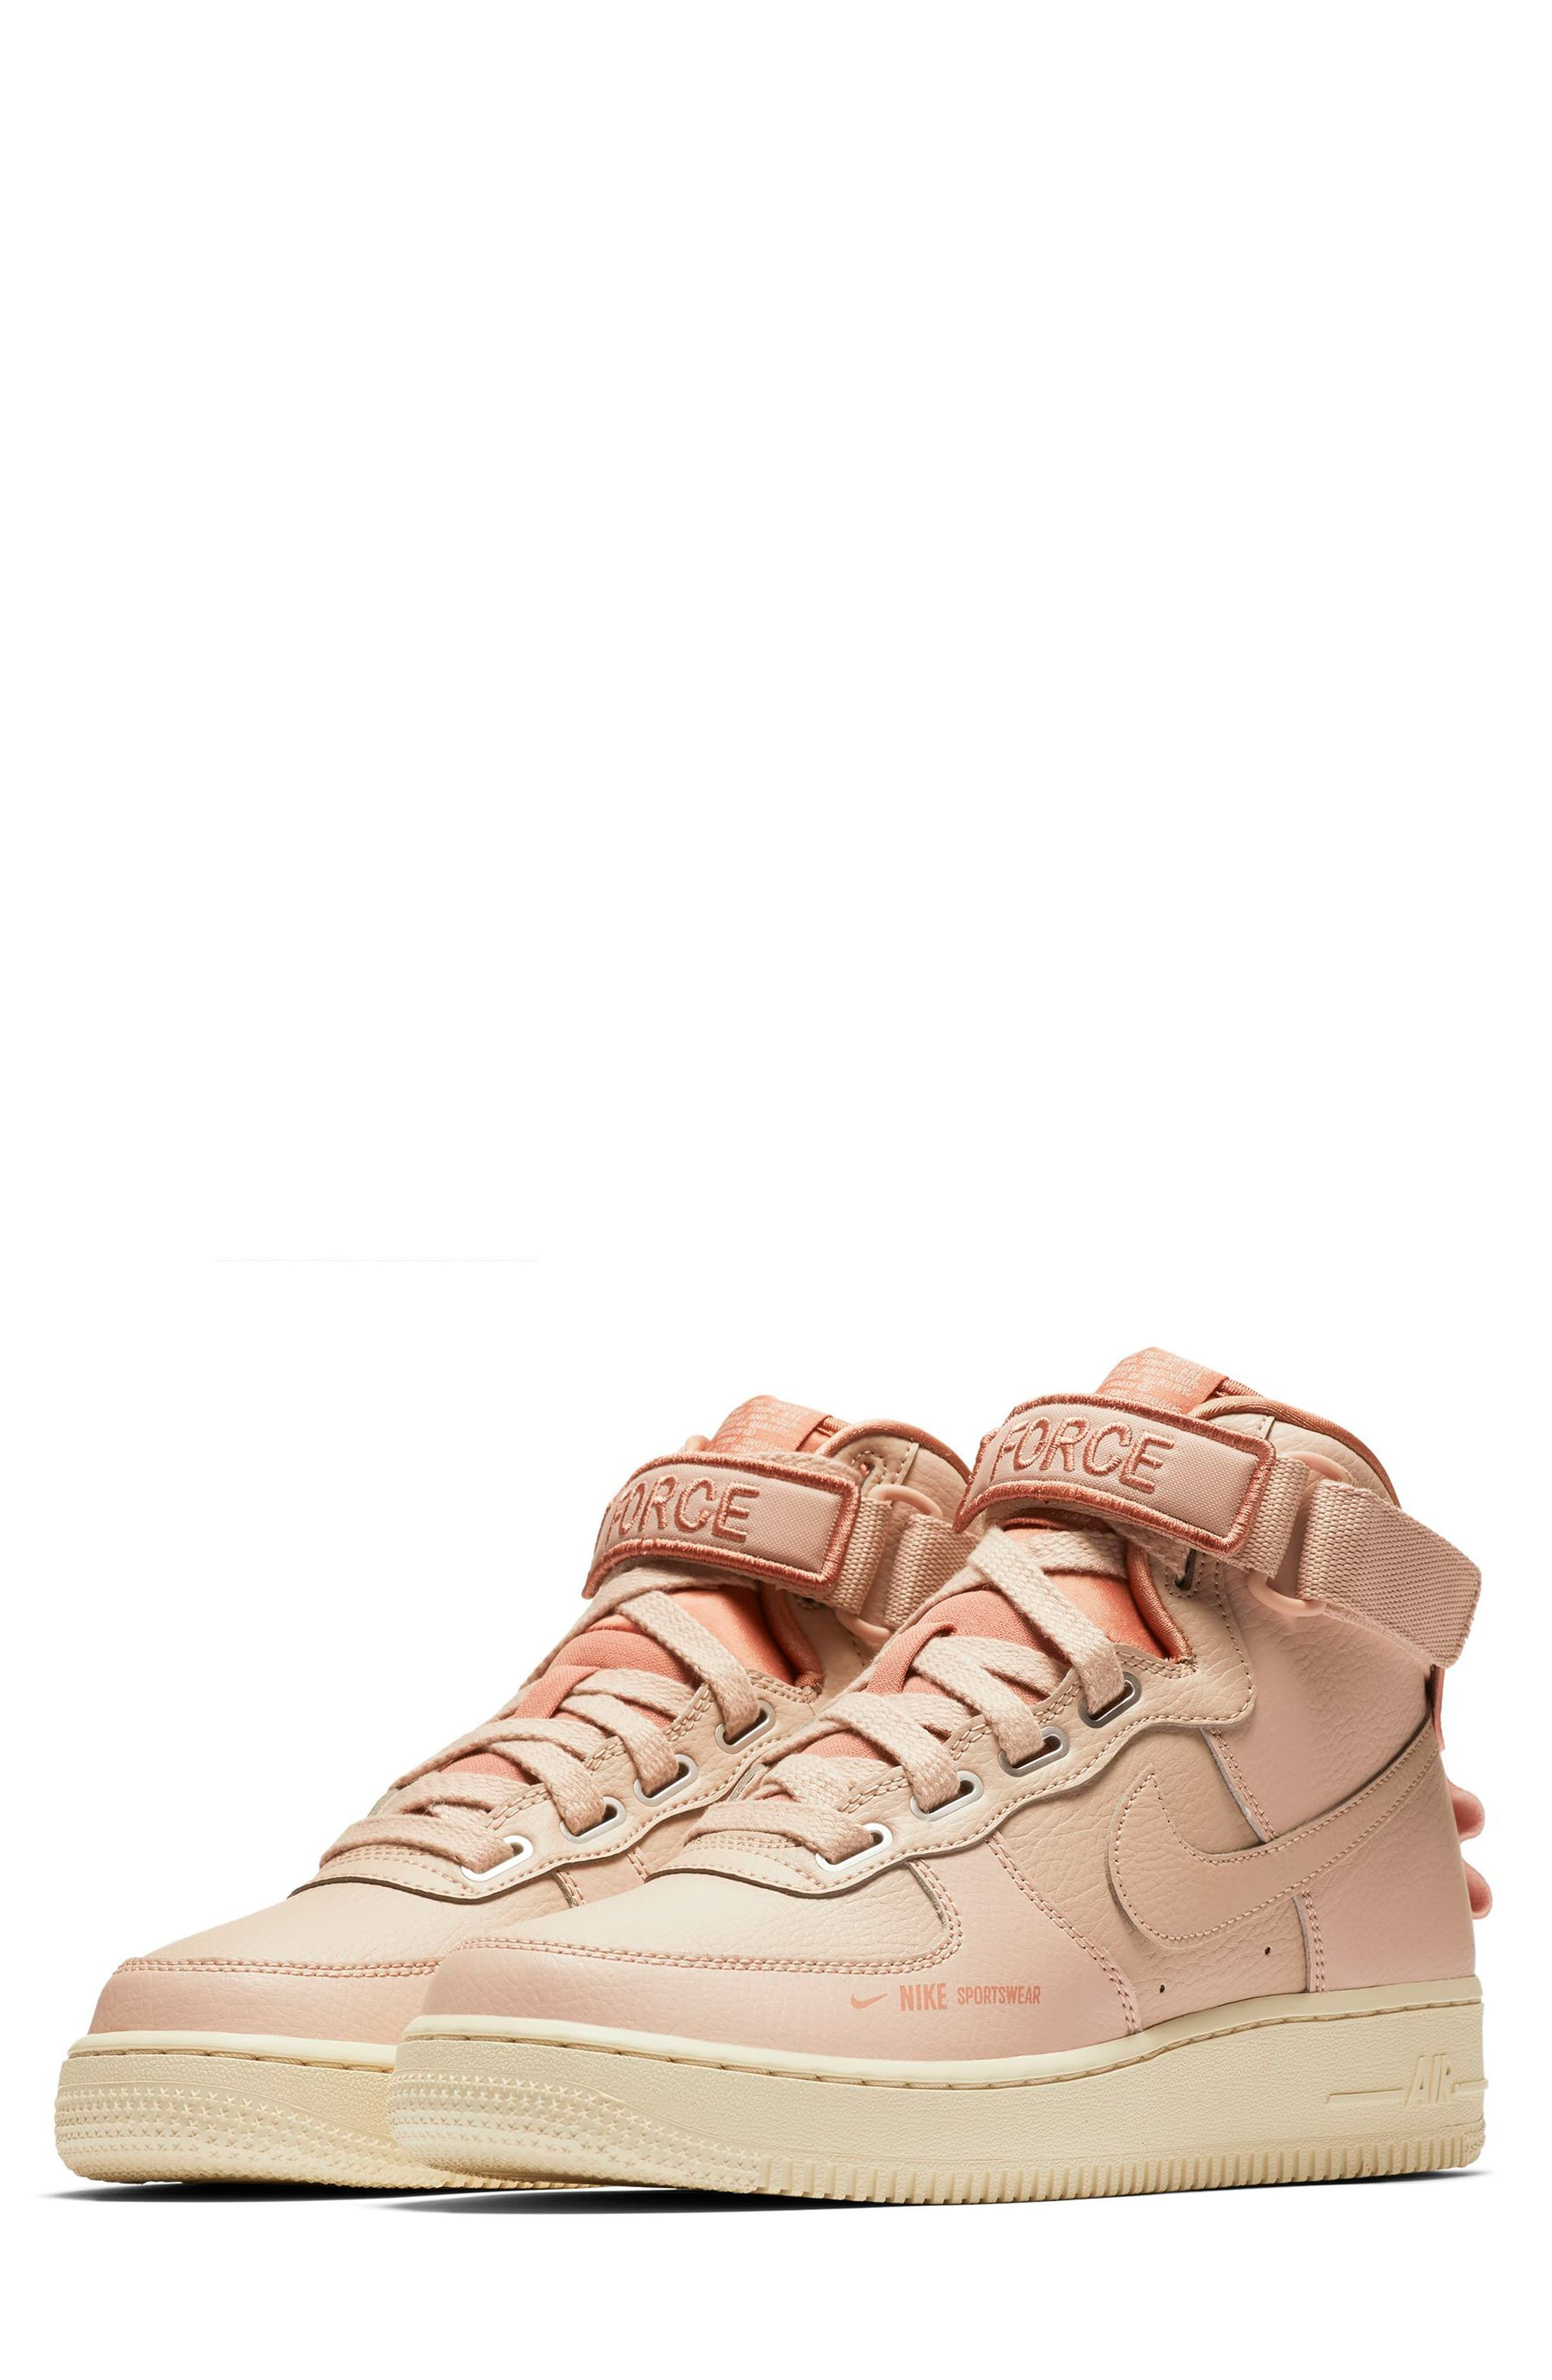 Women's Nike Air Force 1 High Utility Sneaker, Size 7.5 M